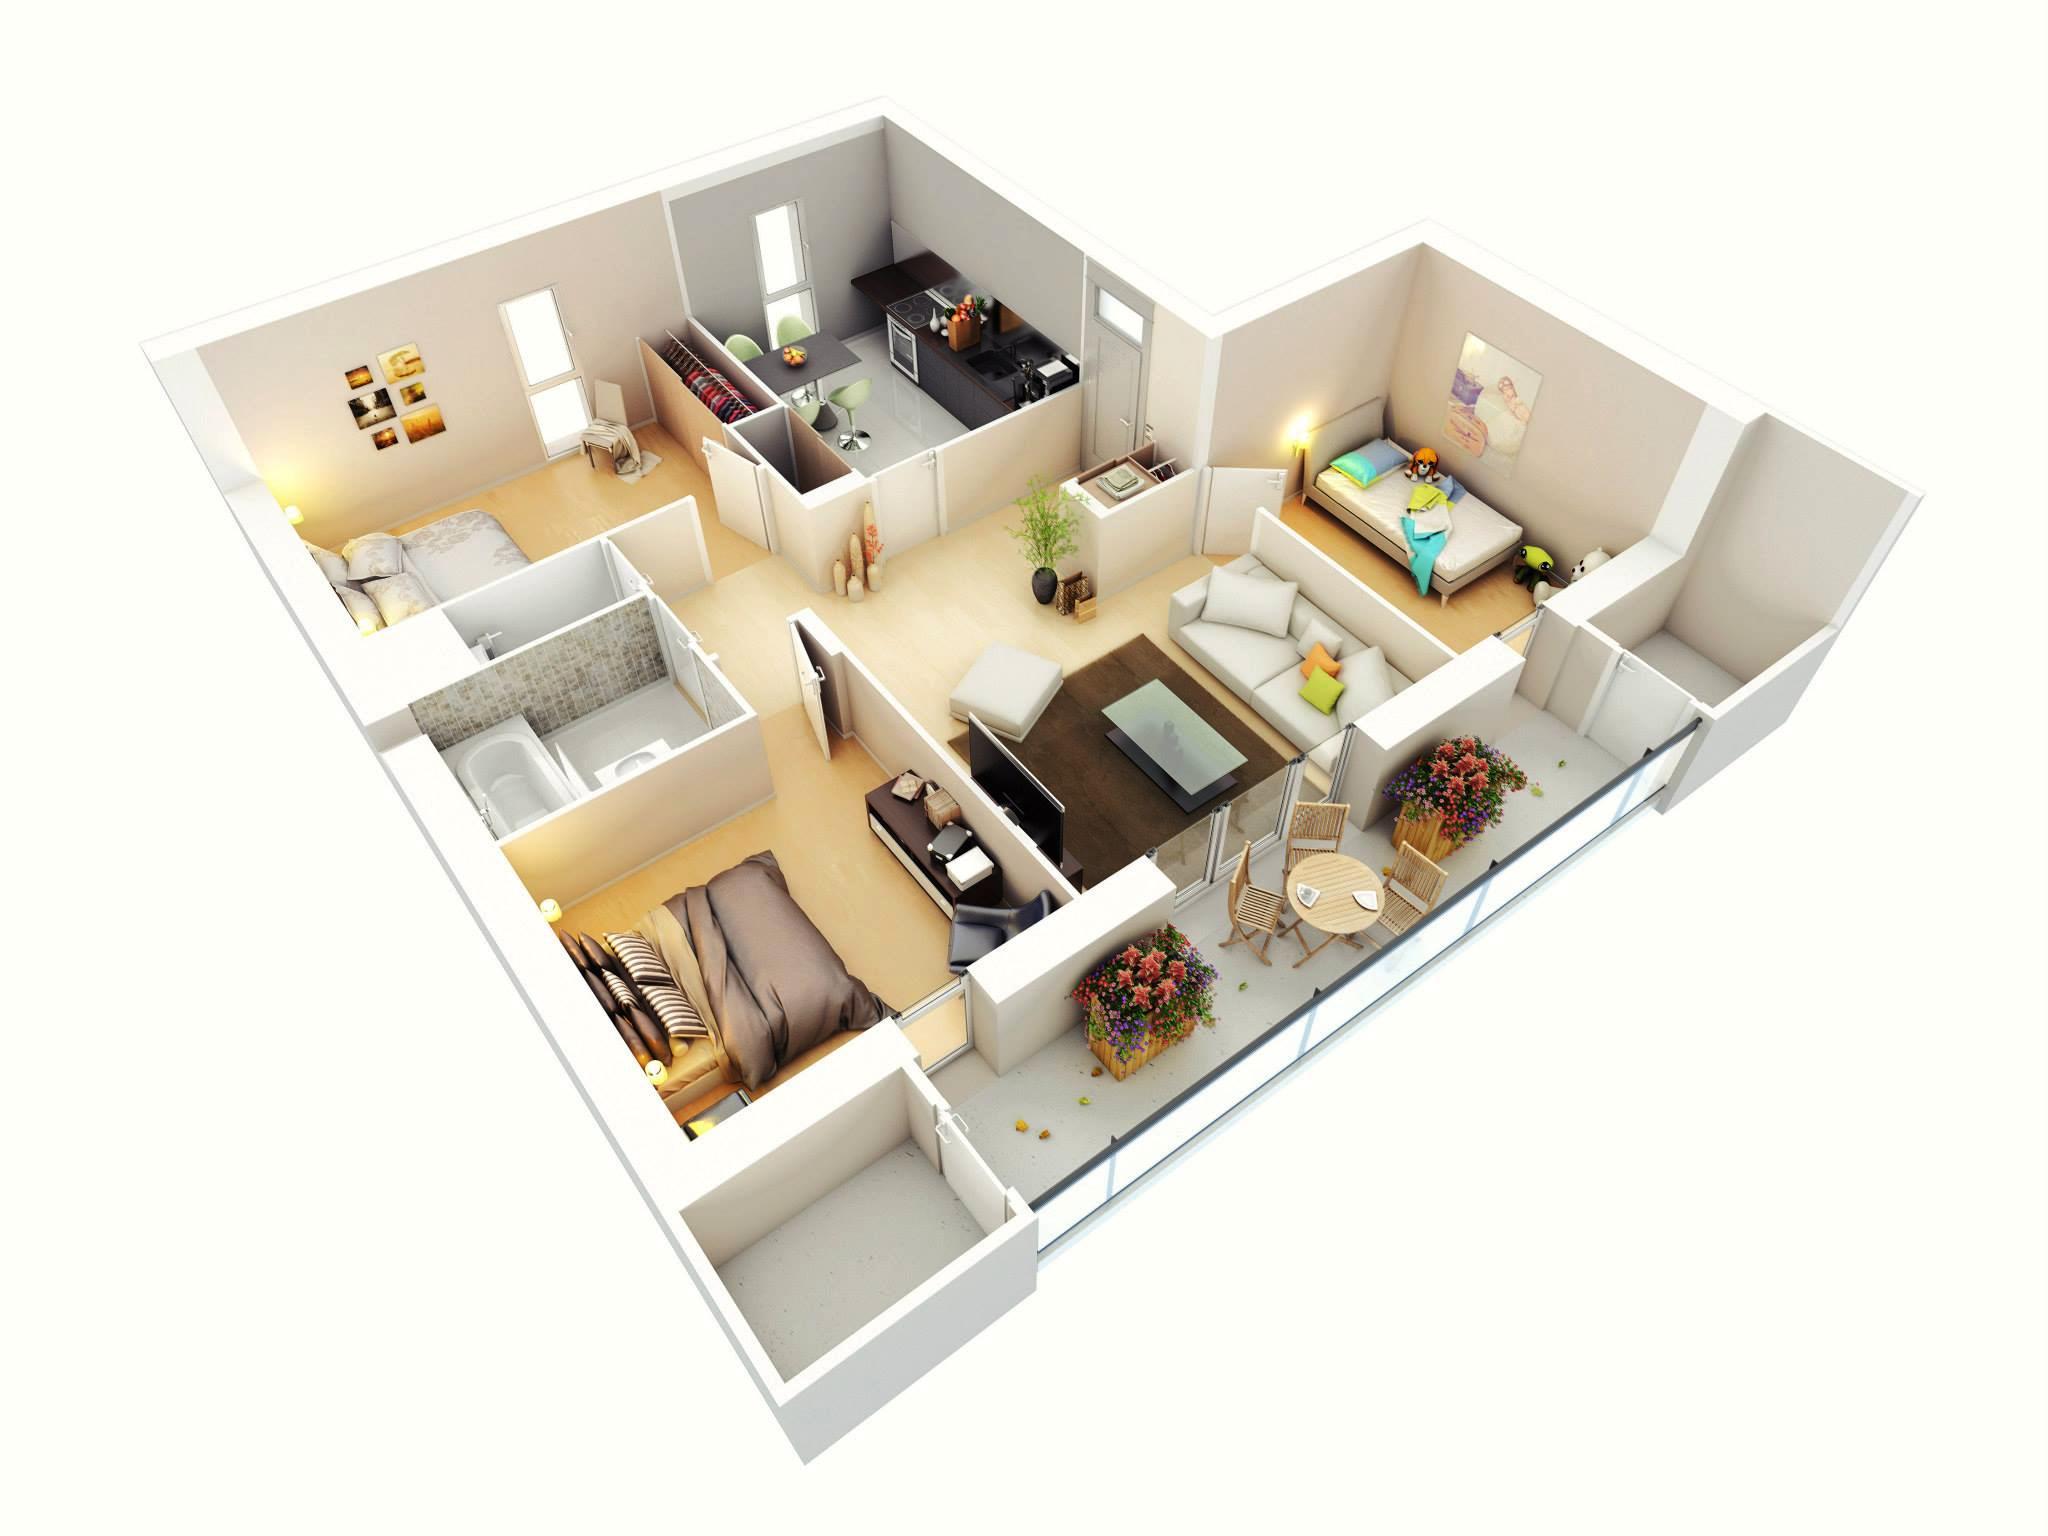 More Bedroom Floor Plans - House Plans  #11